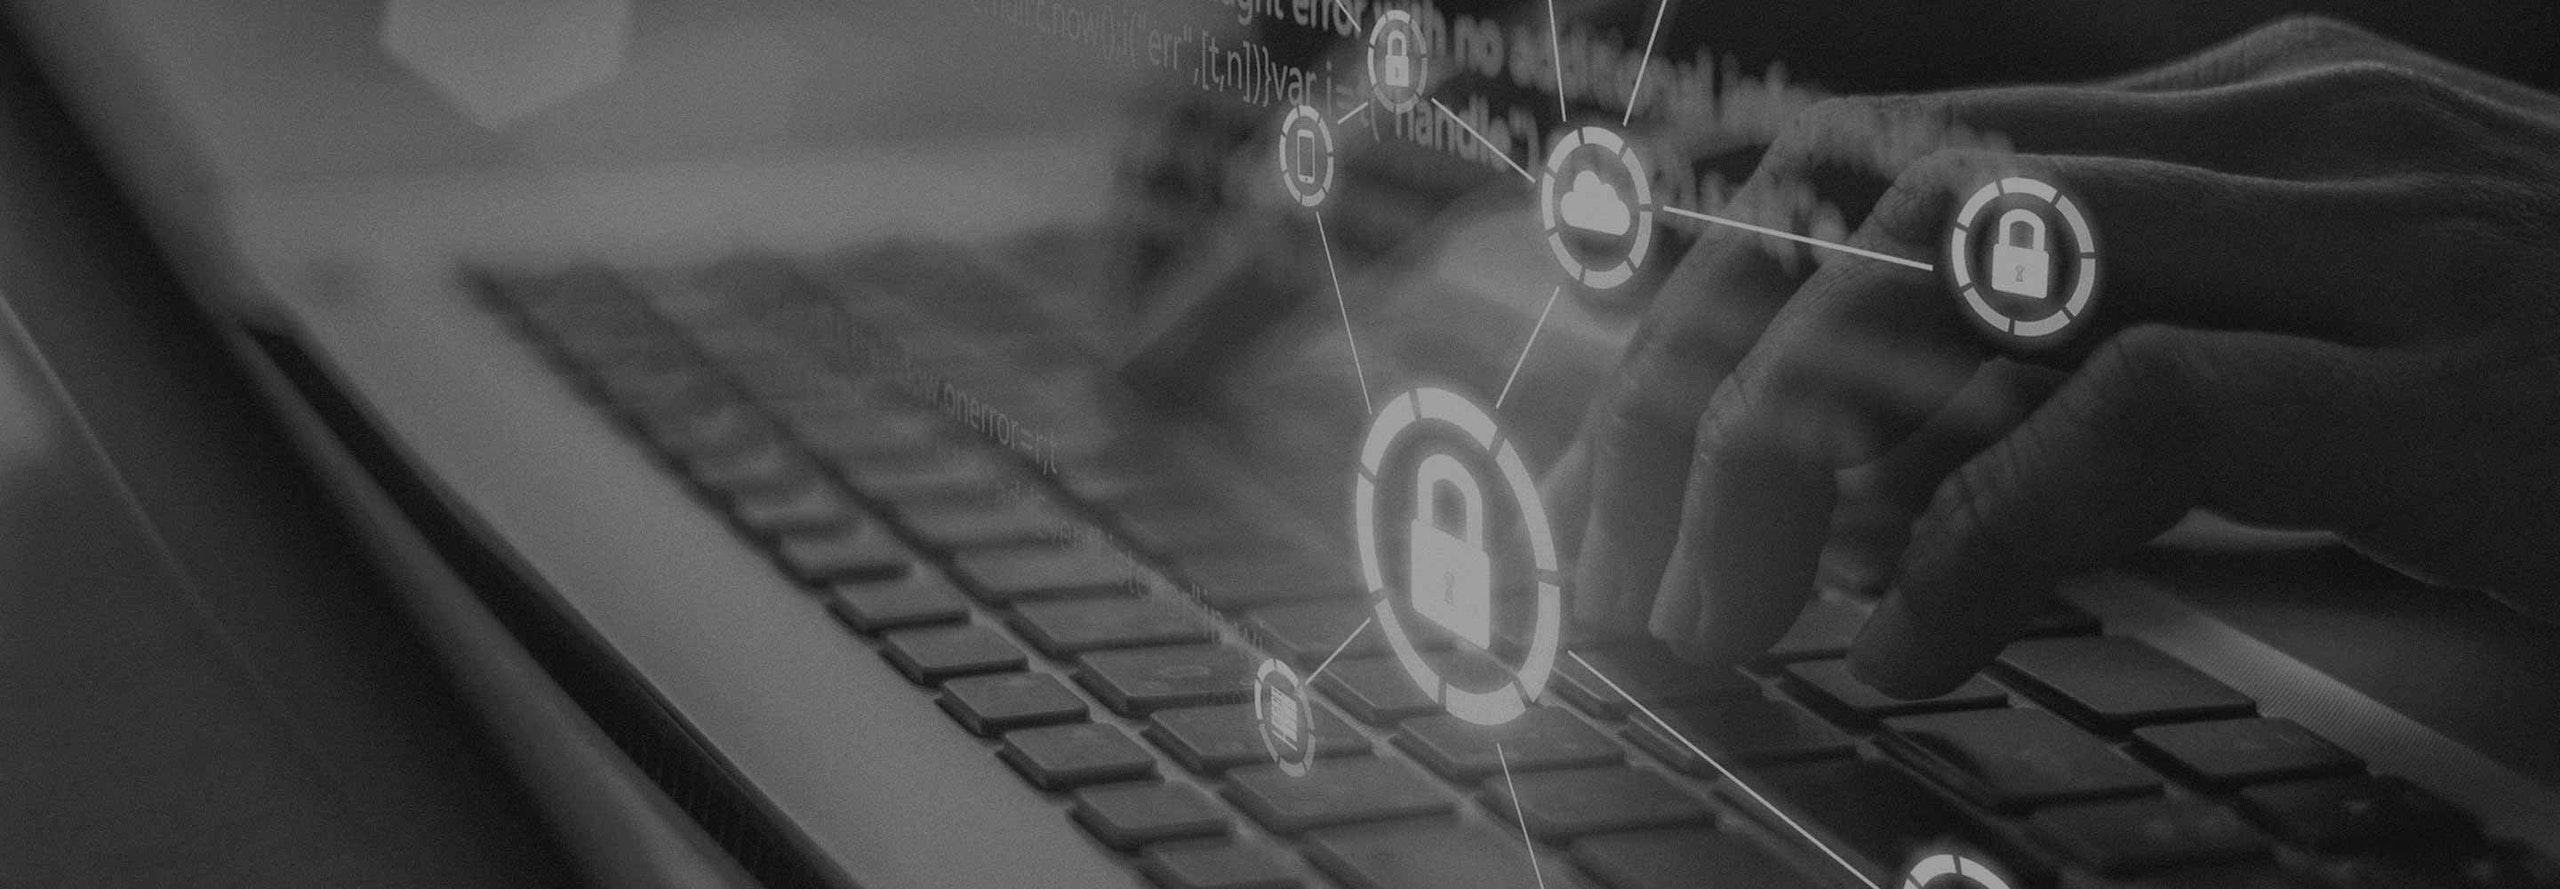 Hero data privacy team